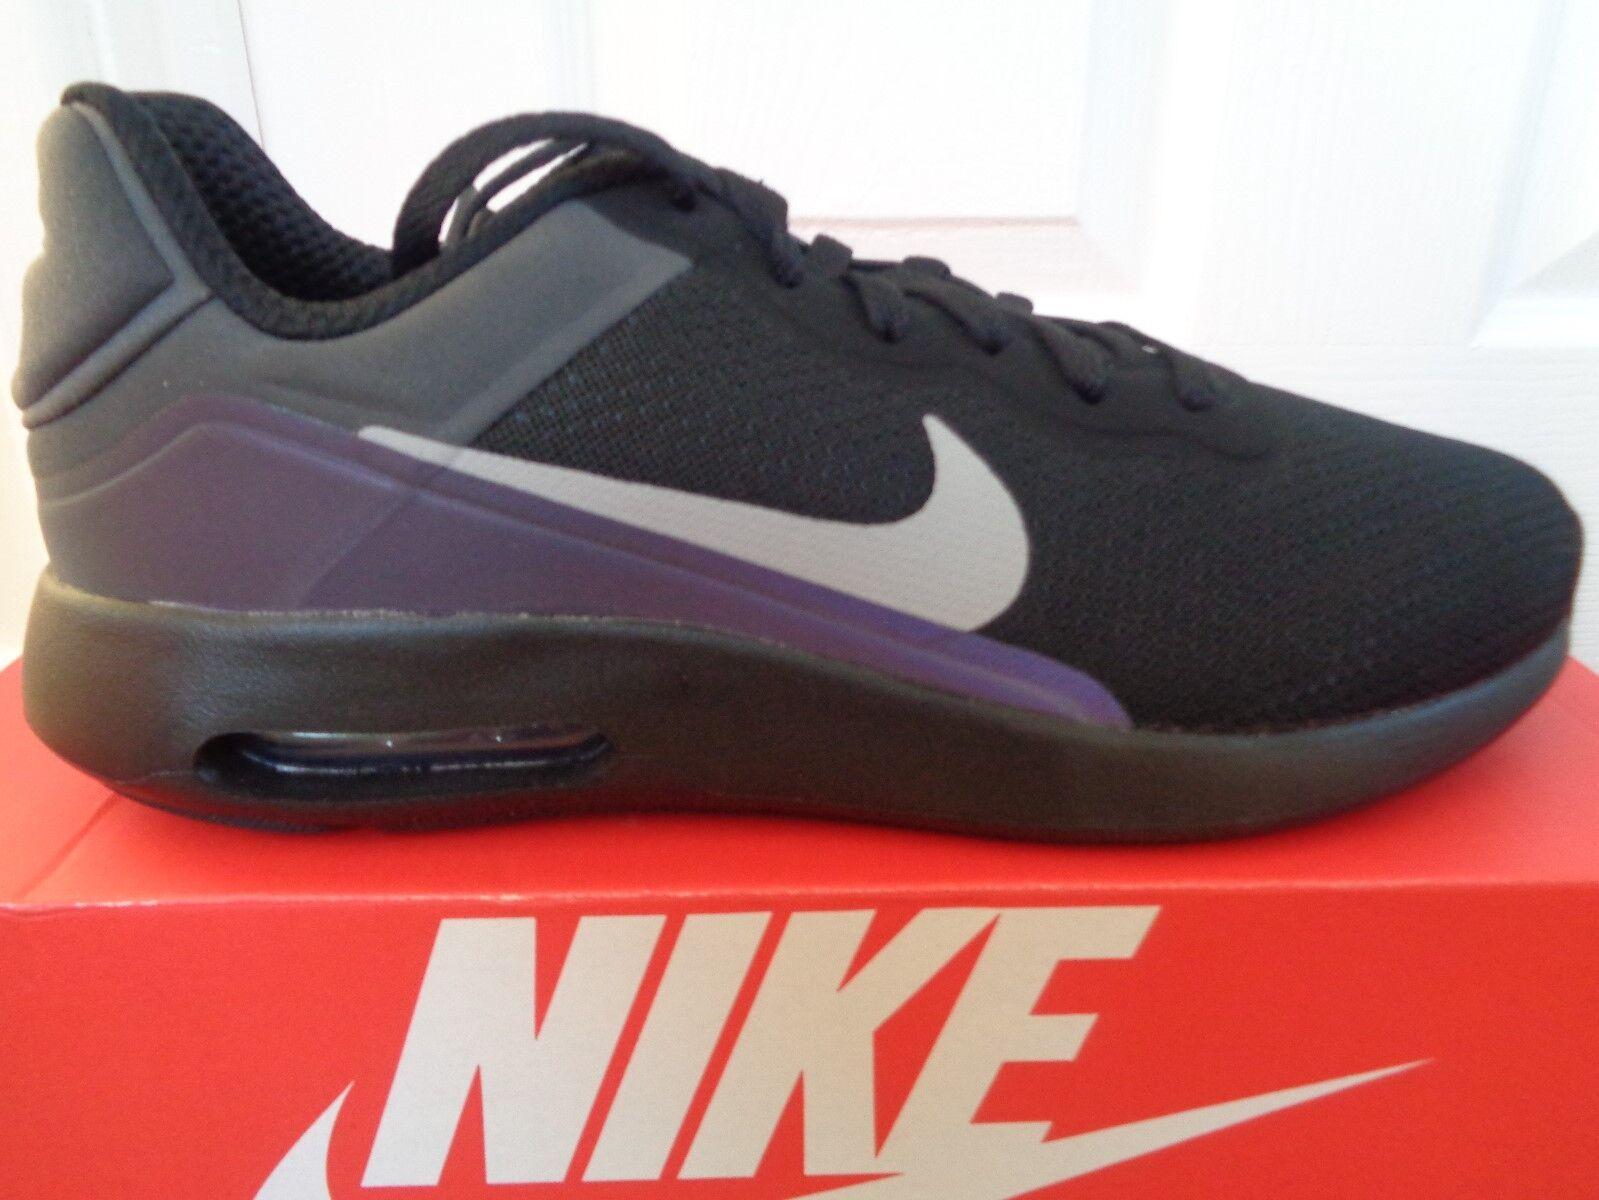 Nike AIR MAX moderno SE Sneaker Uomo 42.5 Sneaker 844876 003 EU 42.5 Uomo US 9 NUOVE 38176f